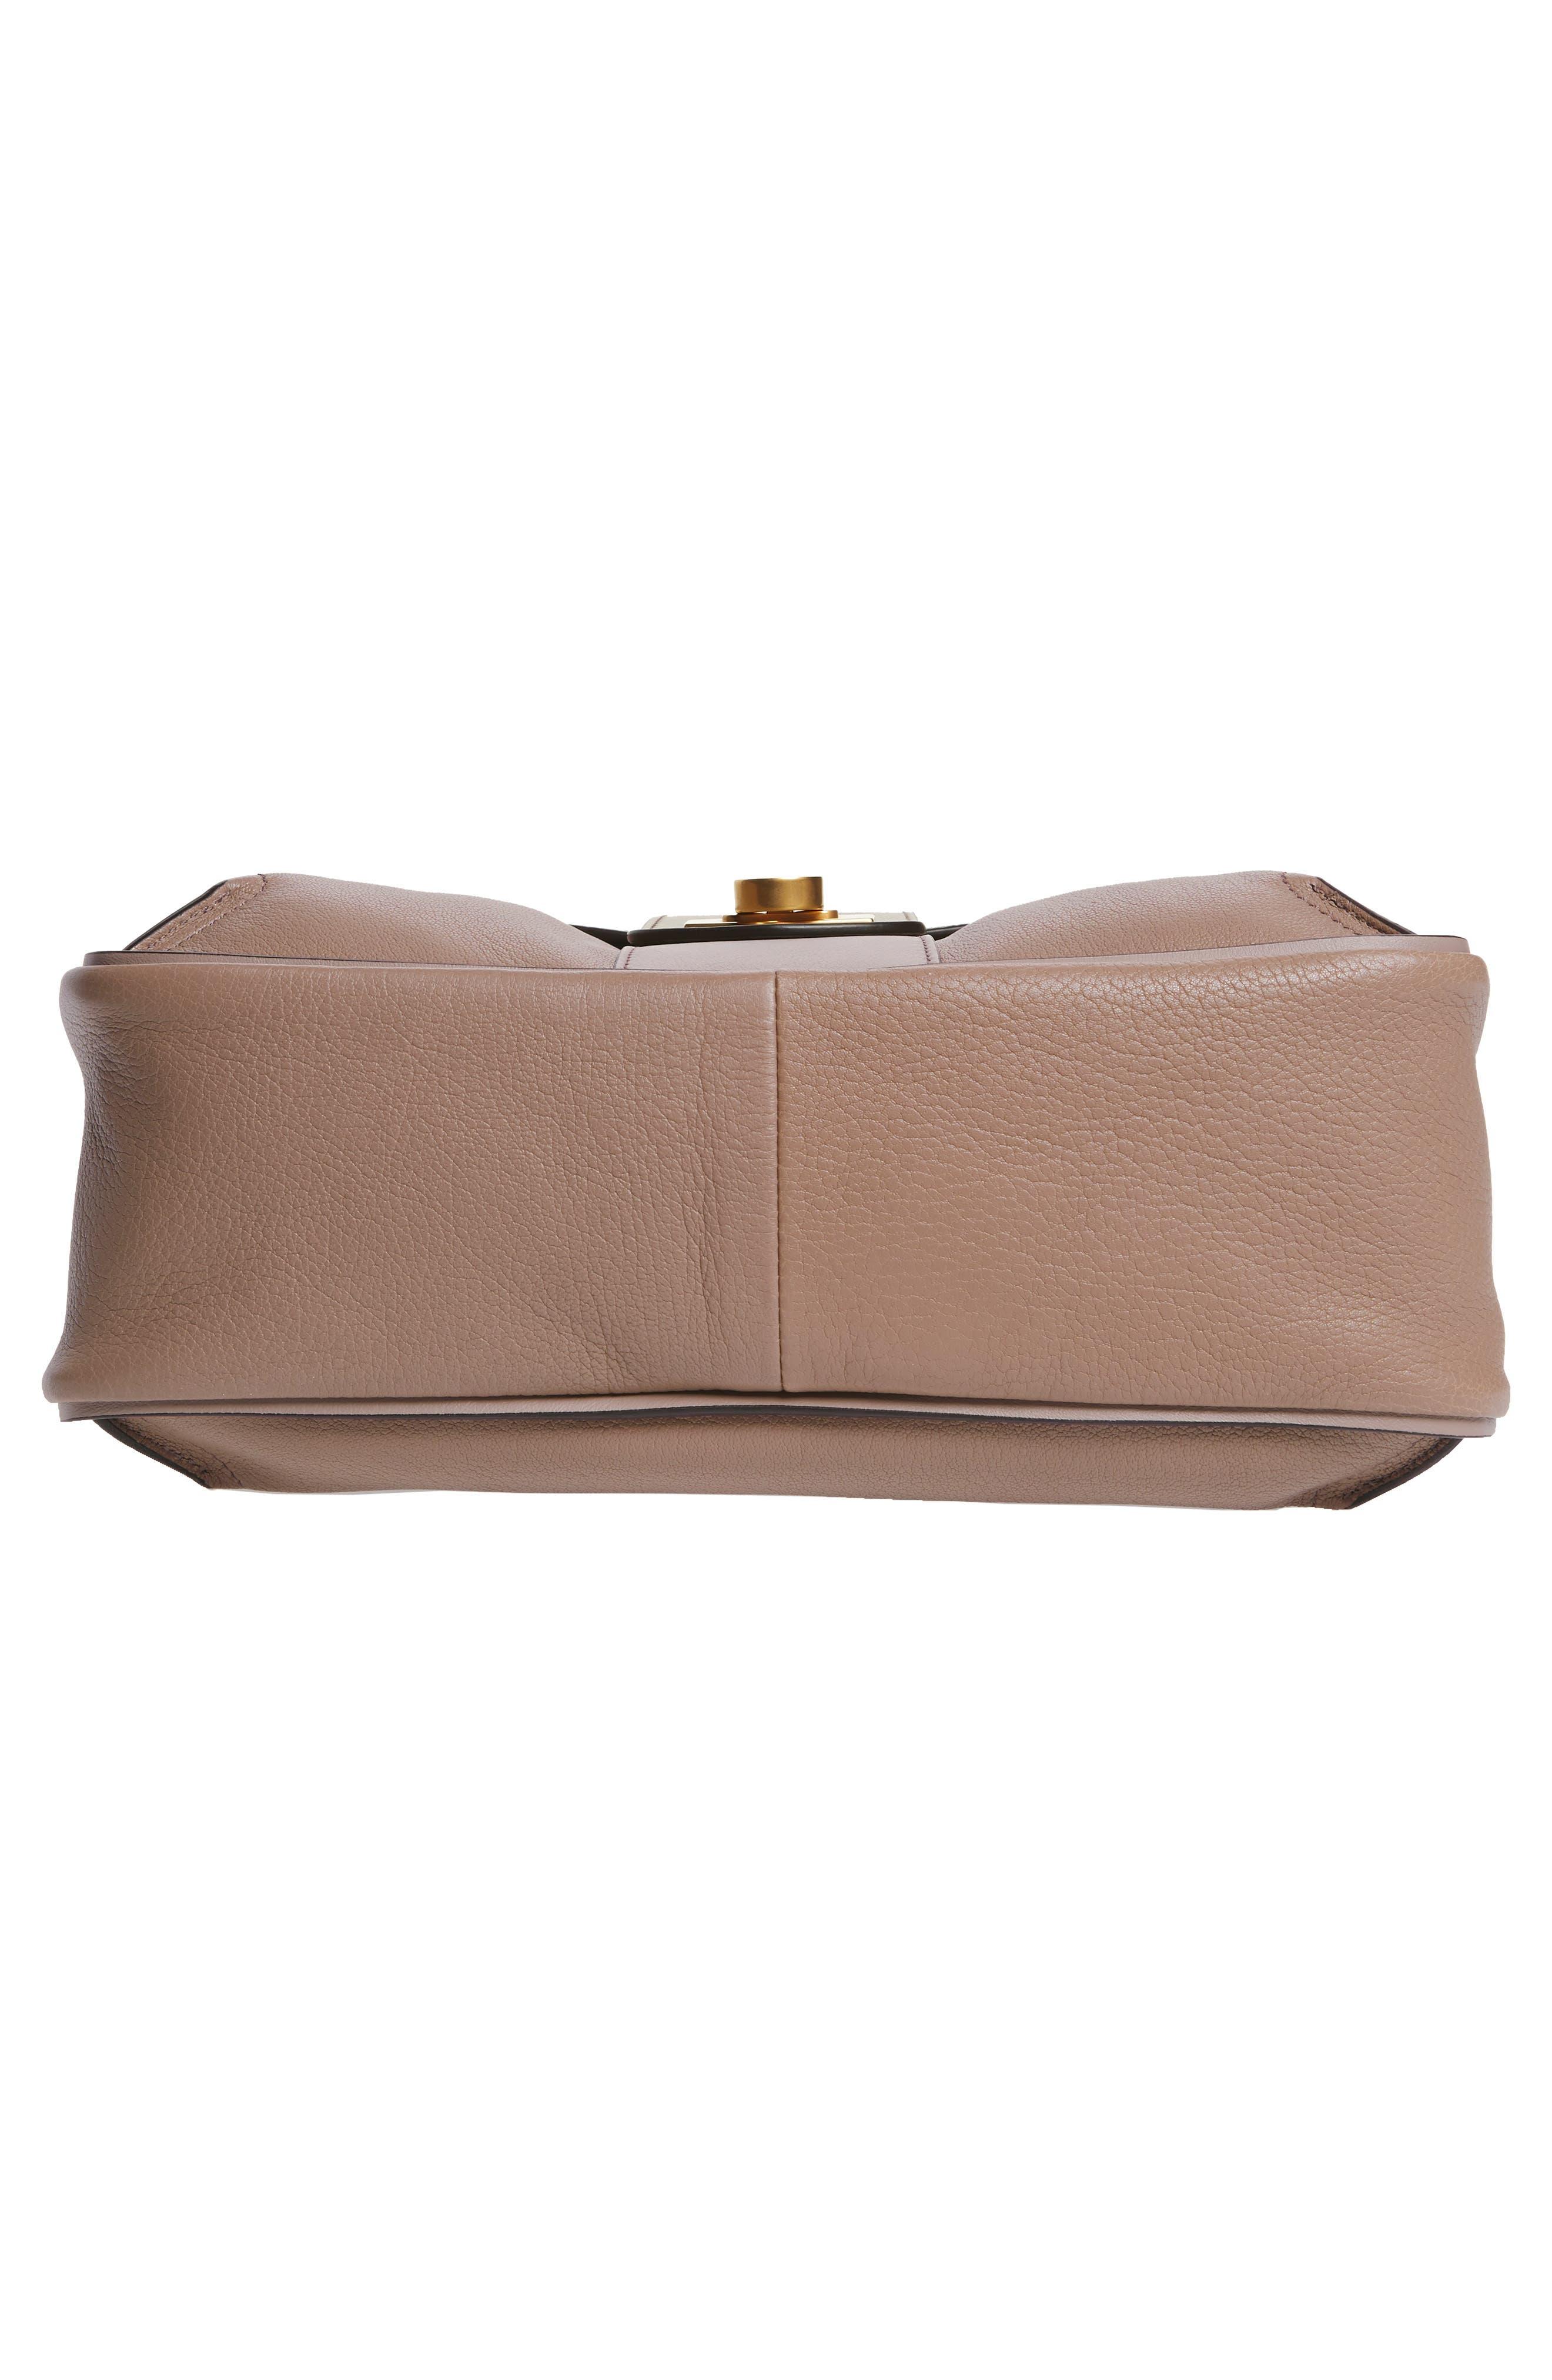 CHLOÉ,                             Small Lexa Leather Shoulder Bag,                             Alternate thumbnail 6, color,                             031